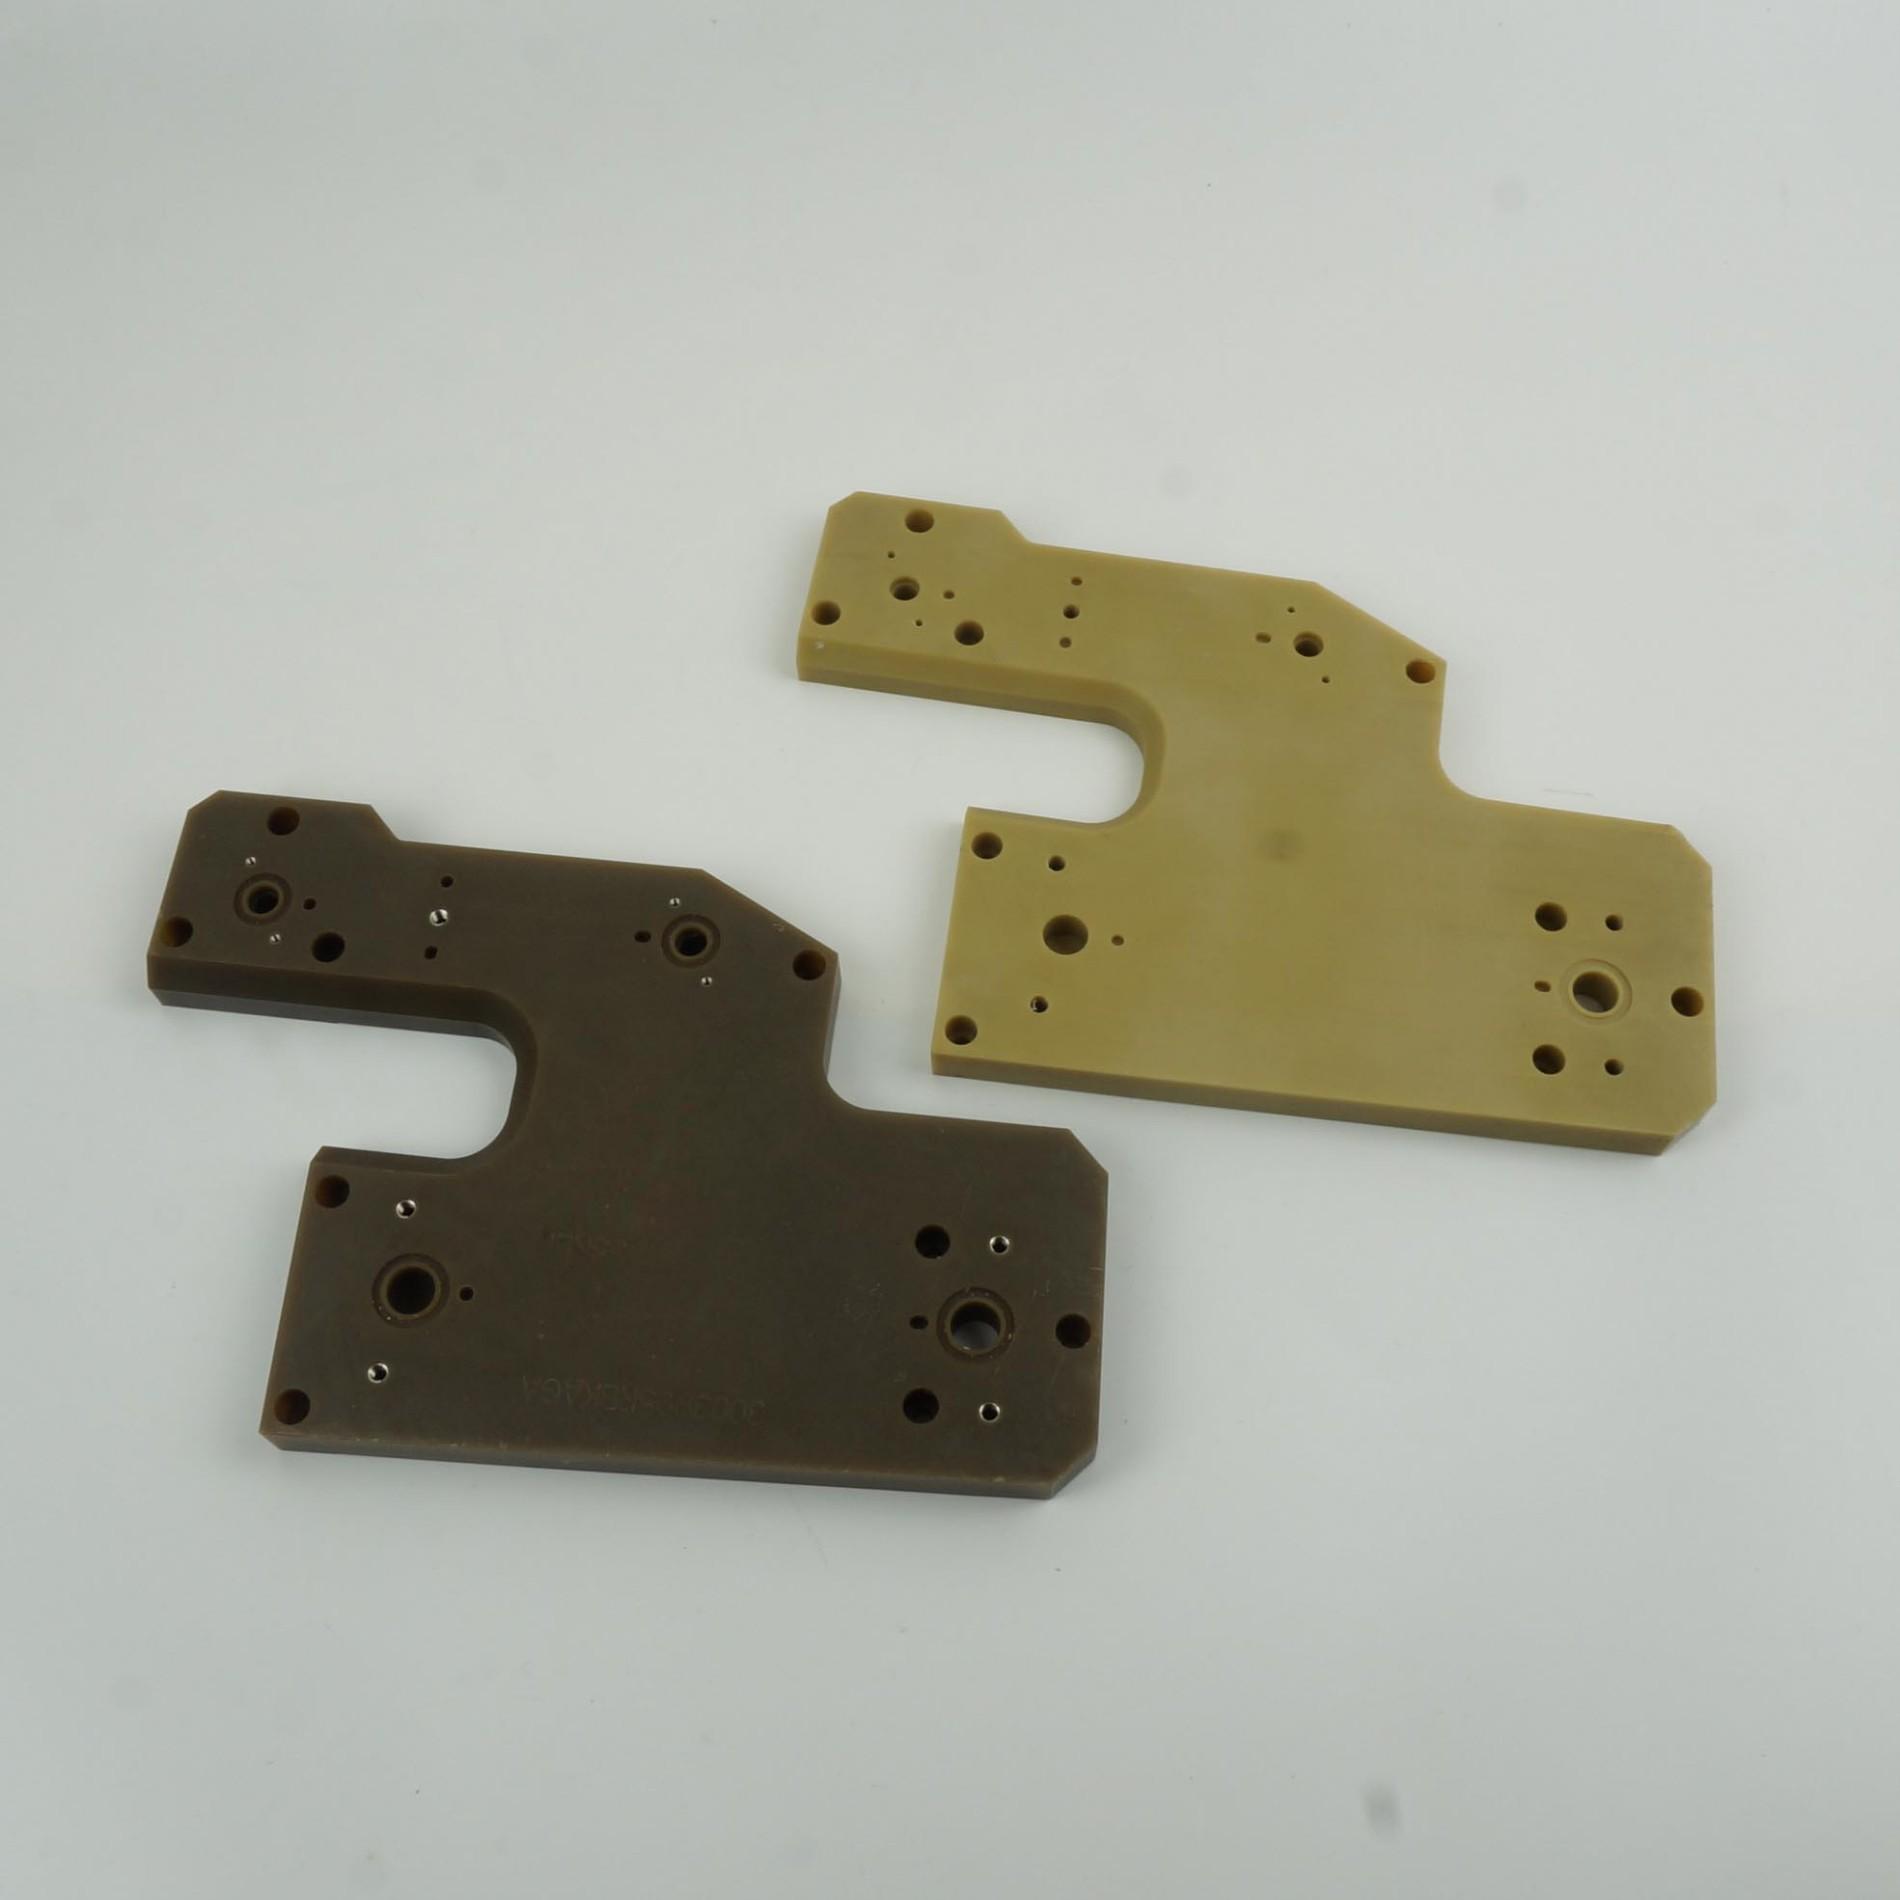 3D Printing Rapid Prototype Parts Services Manufacturers, 3D Printing Rapid Prototype Parts Services Factory, Supply 3D Printing Rapid Prototype Parts Services